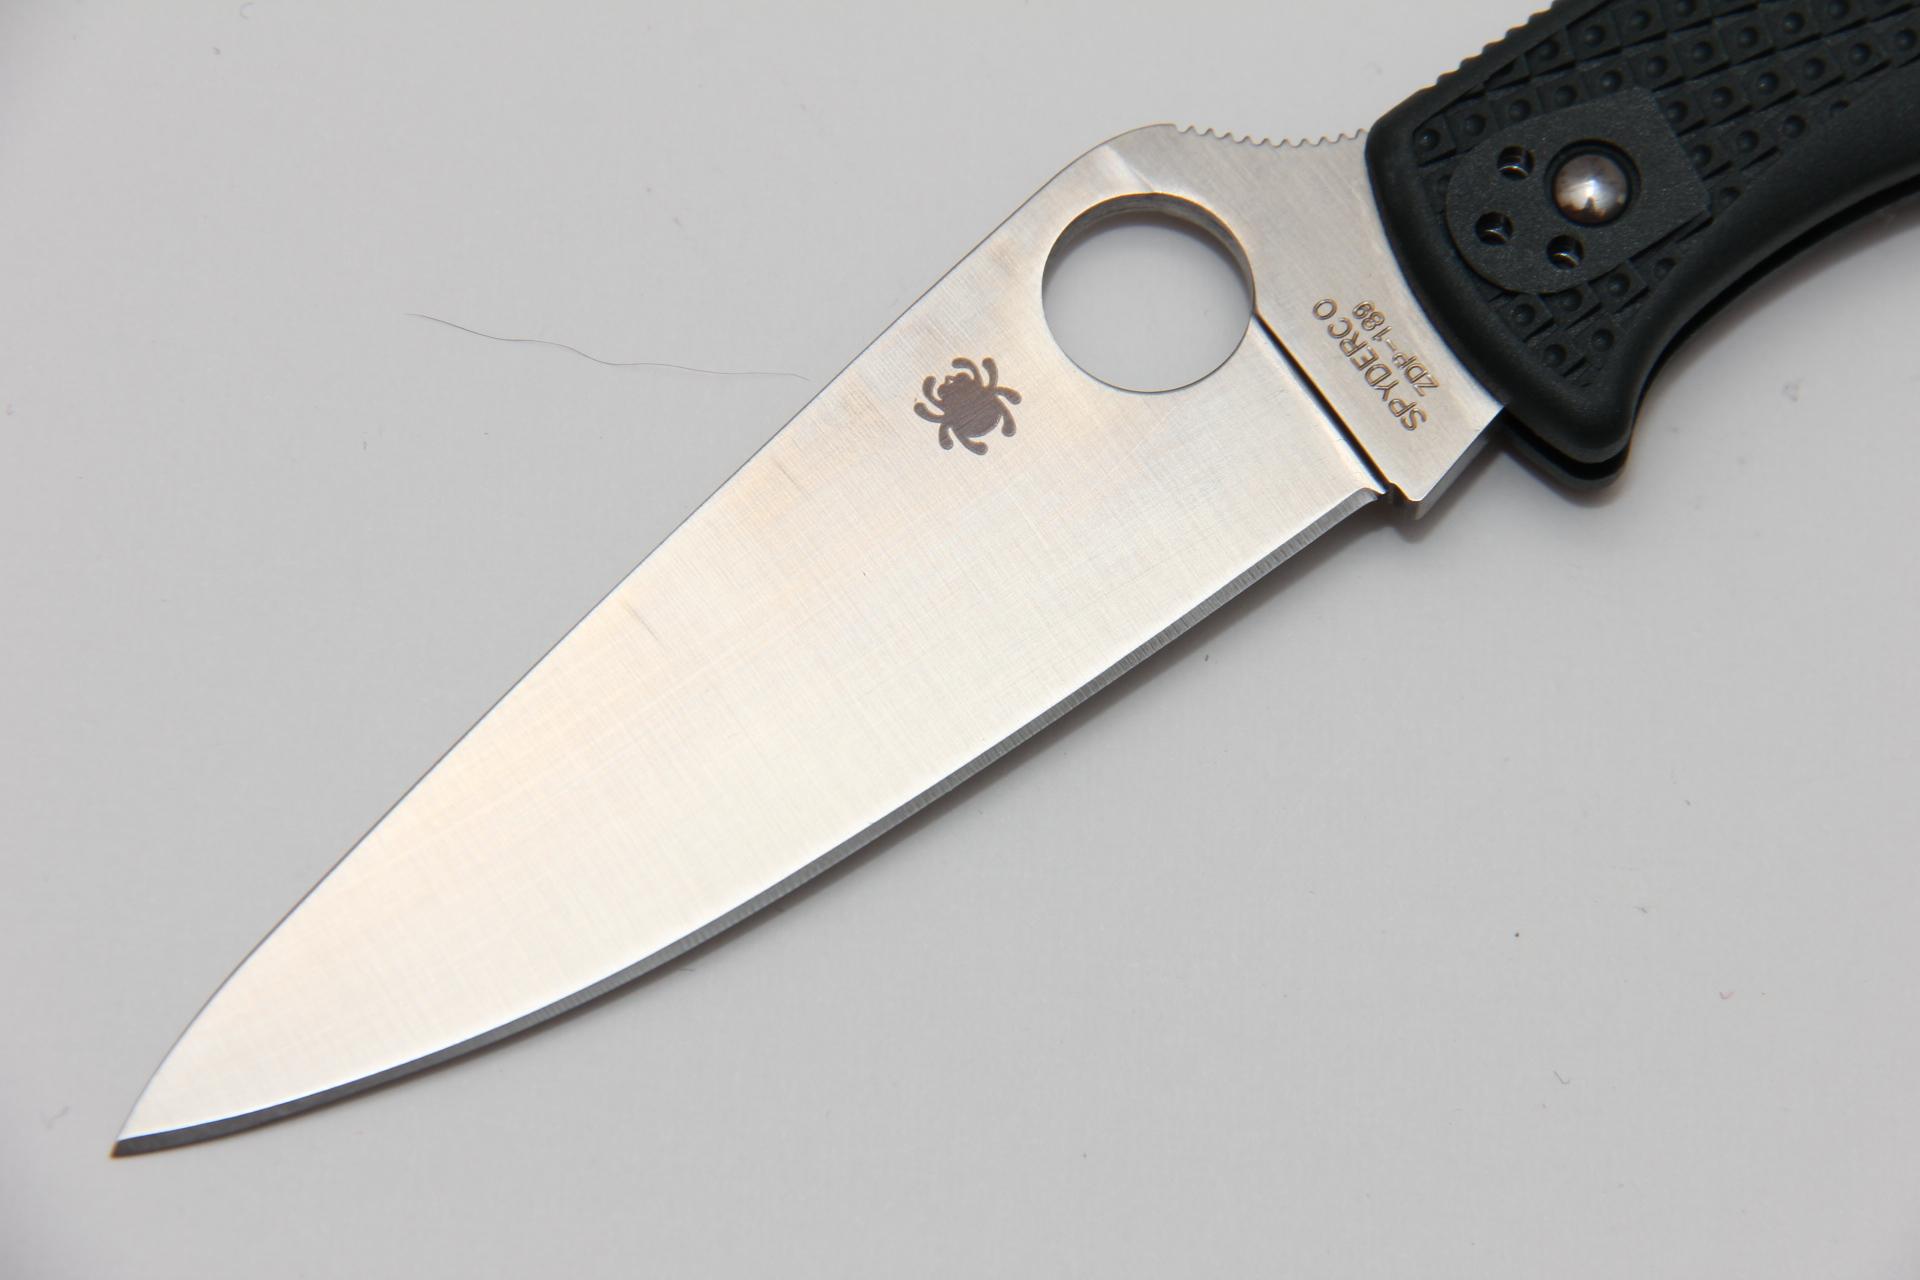 Нож Spyderco Endura 4 SC10PGRE ZDP-189